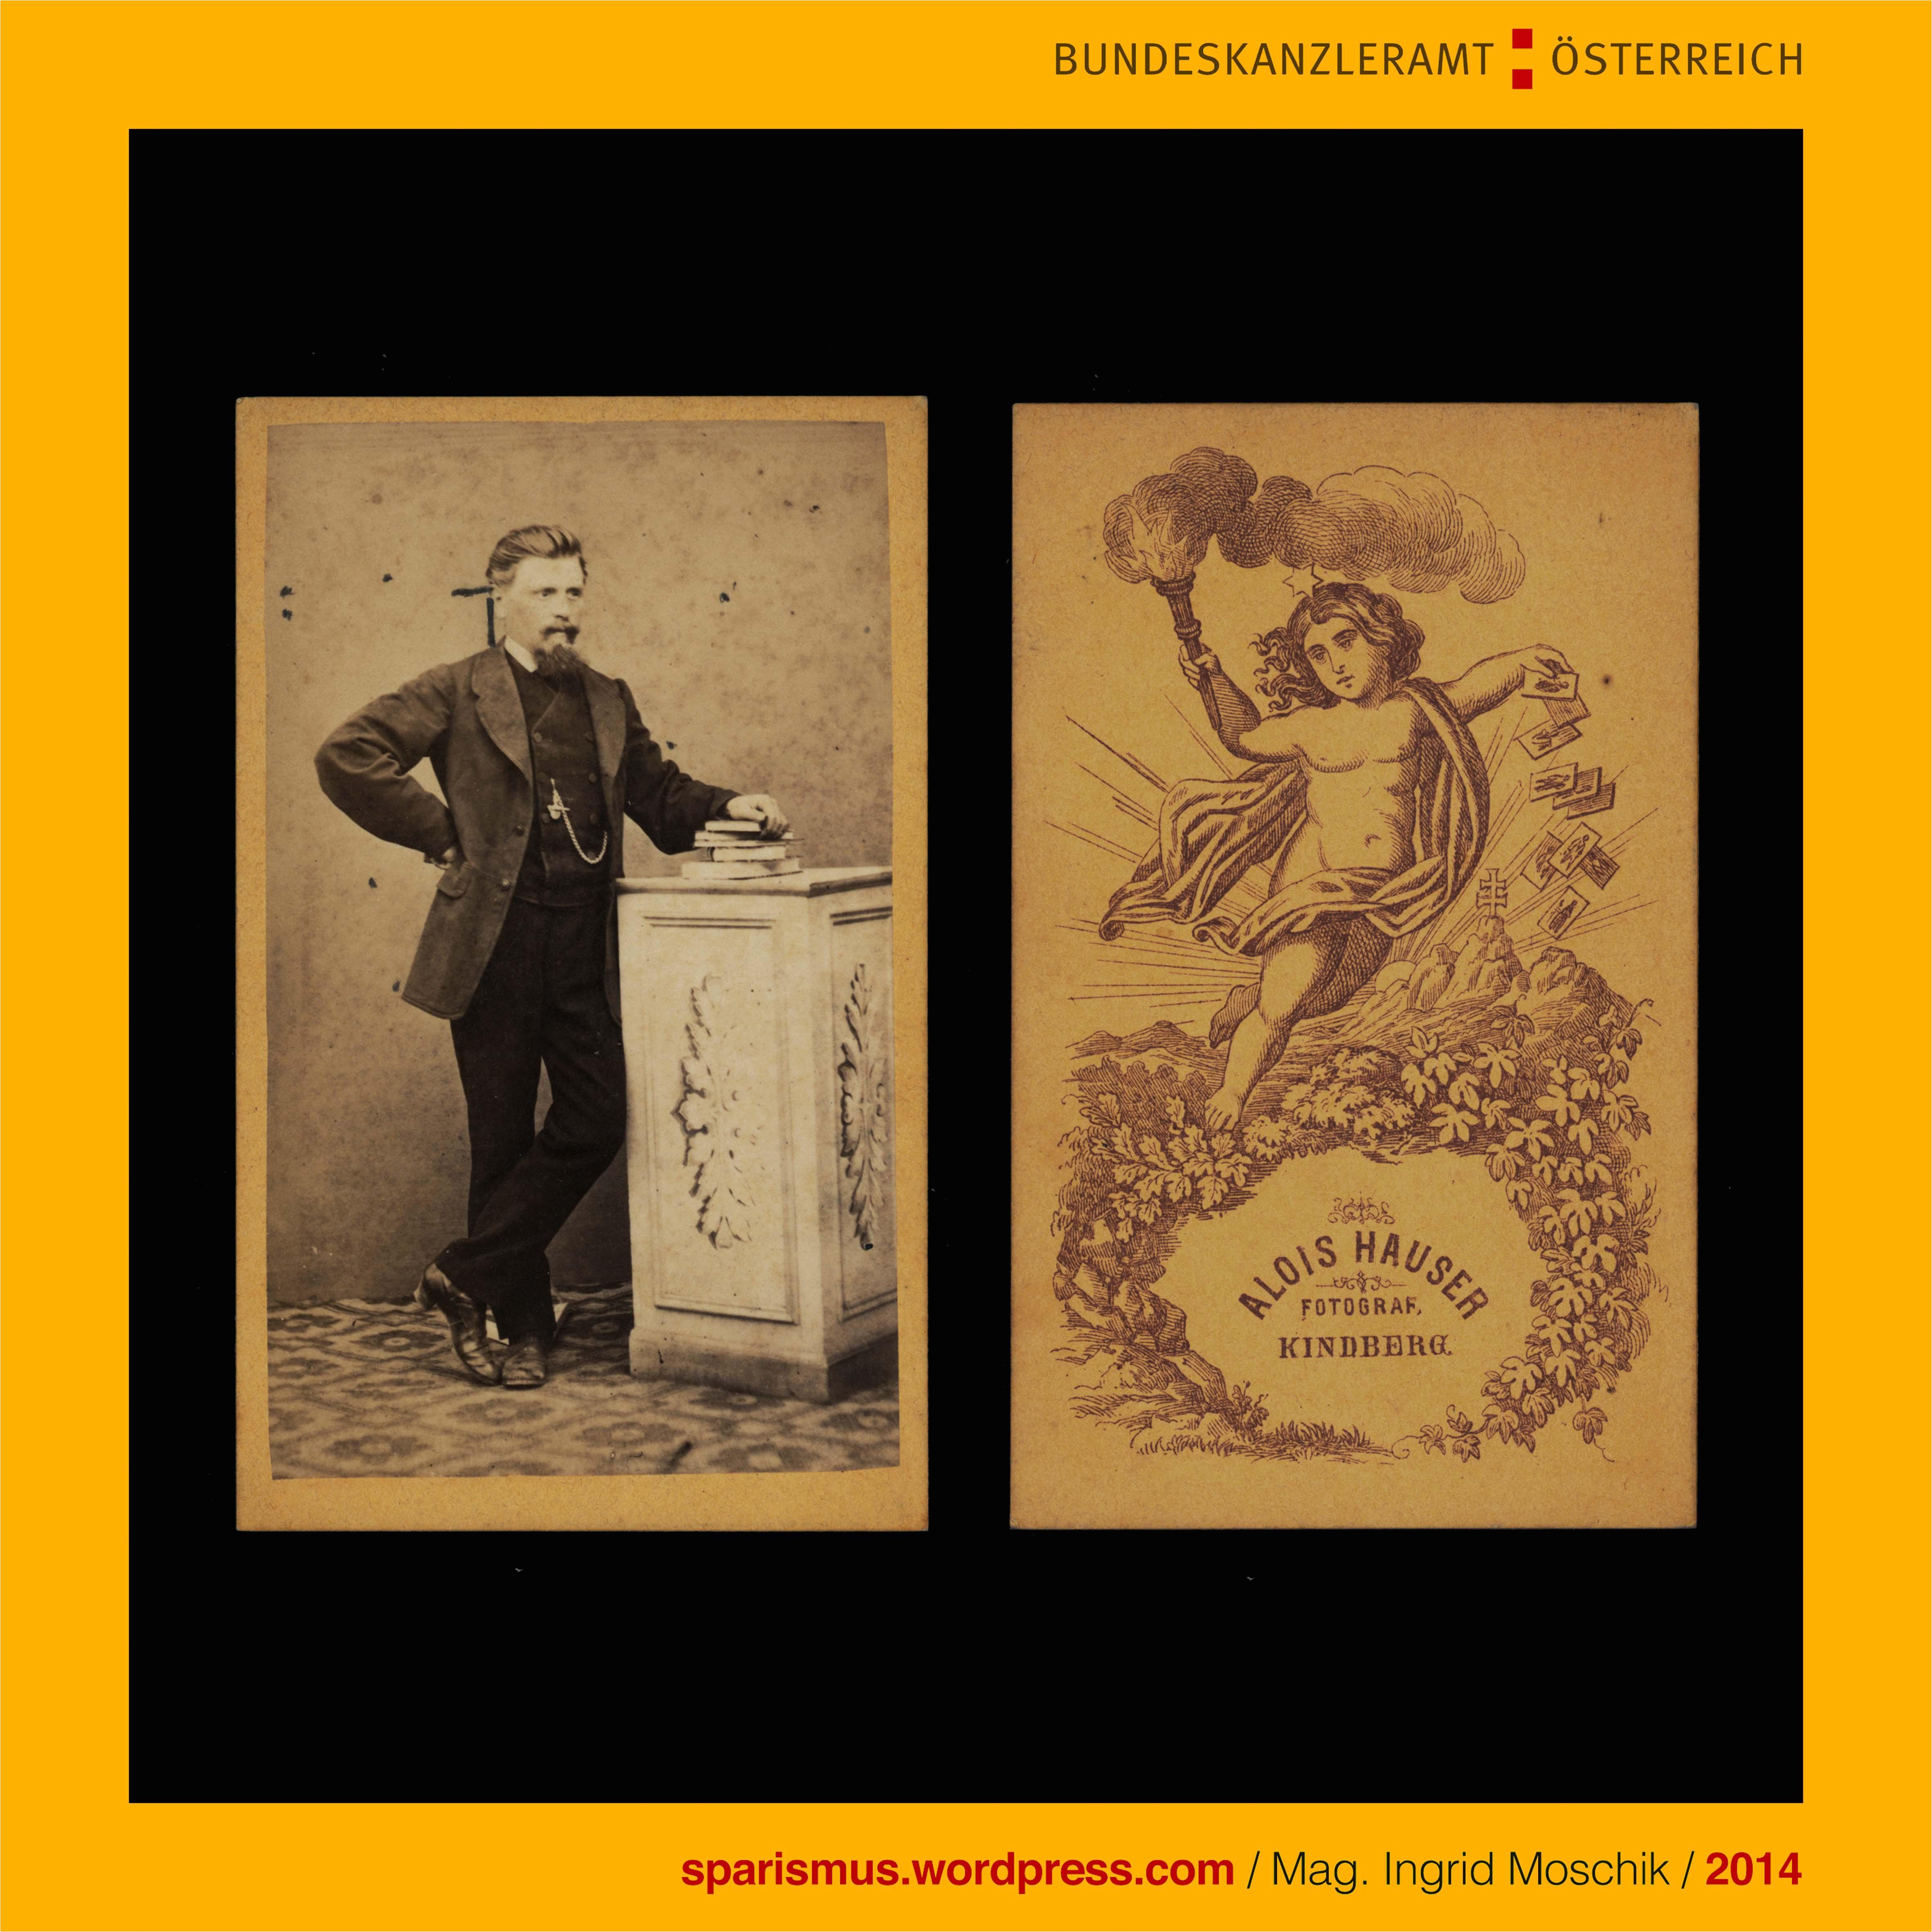 alois hauser als photograph in den 1870ern in kindberg steiermark tatig the austrian